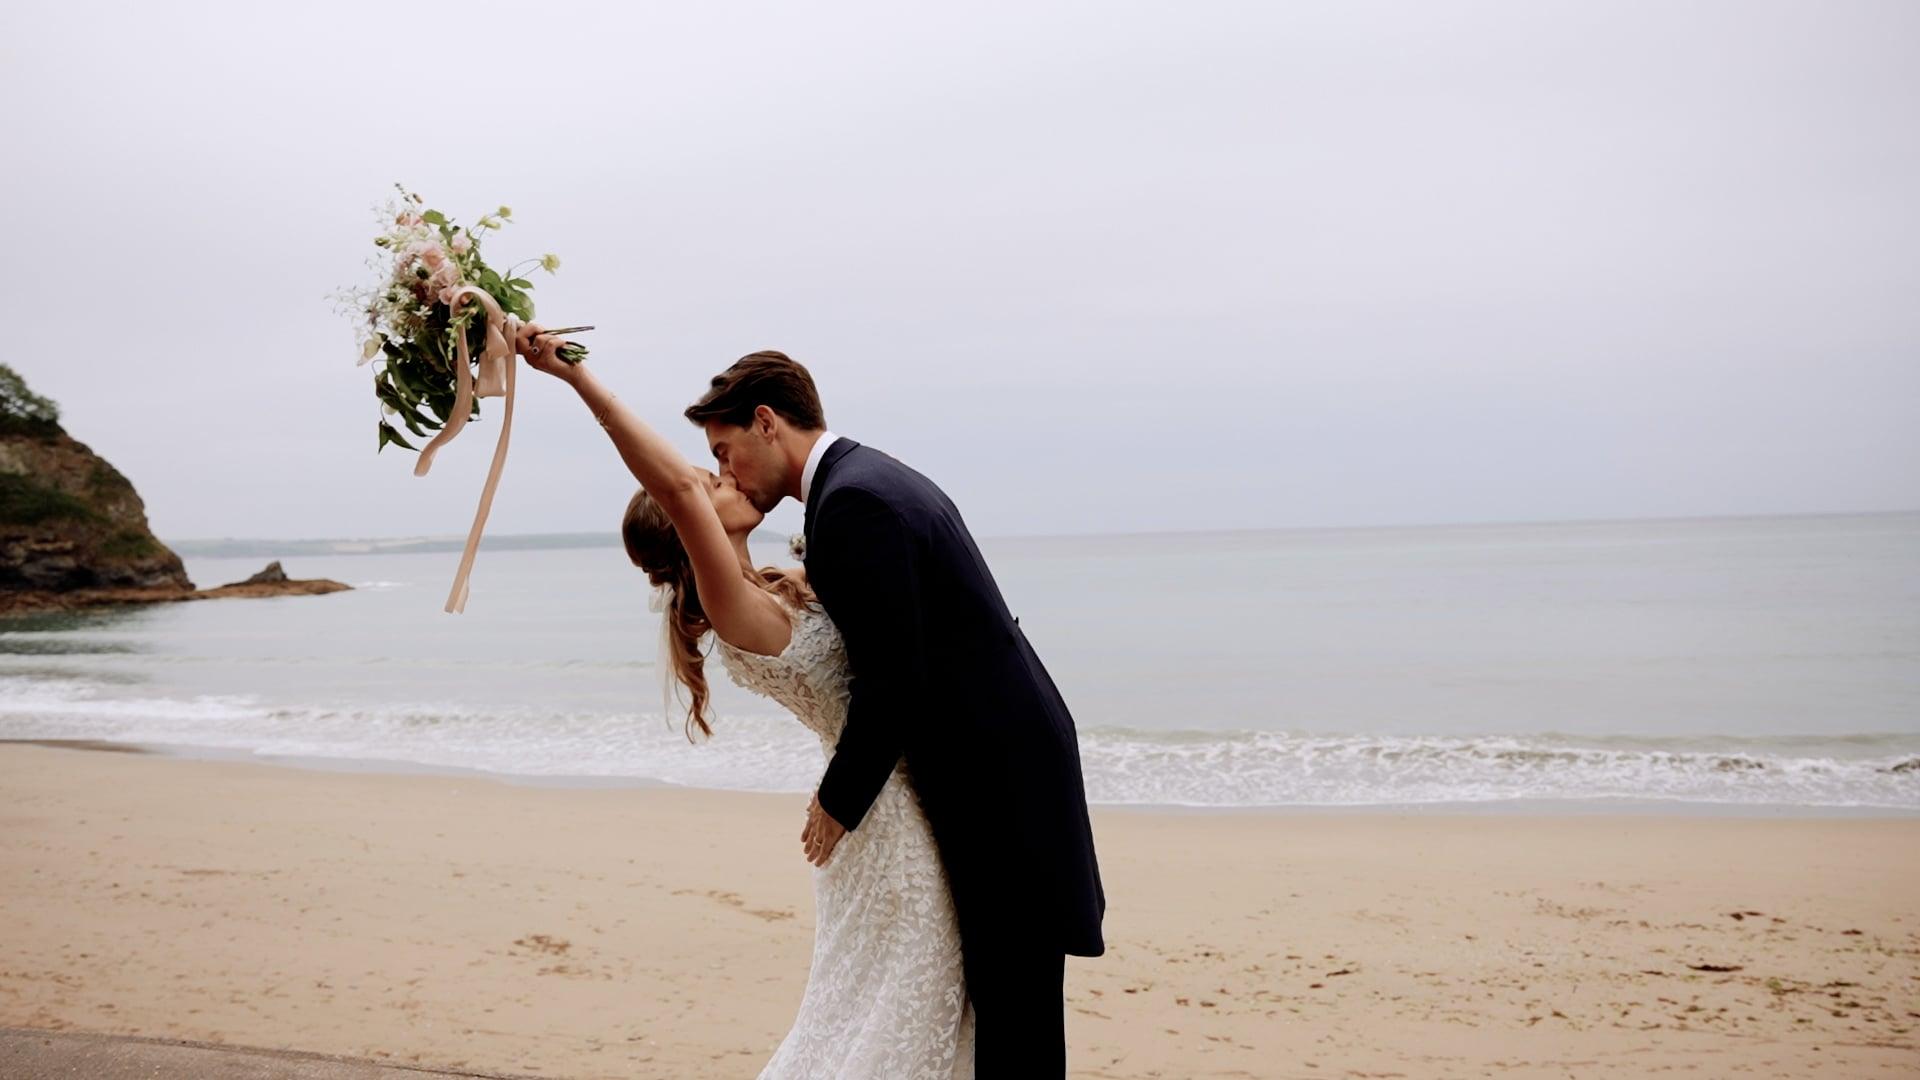 Emily + James - Highlight Wedding Video - Porthpean House, Cornwall